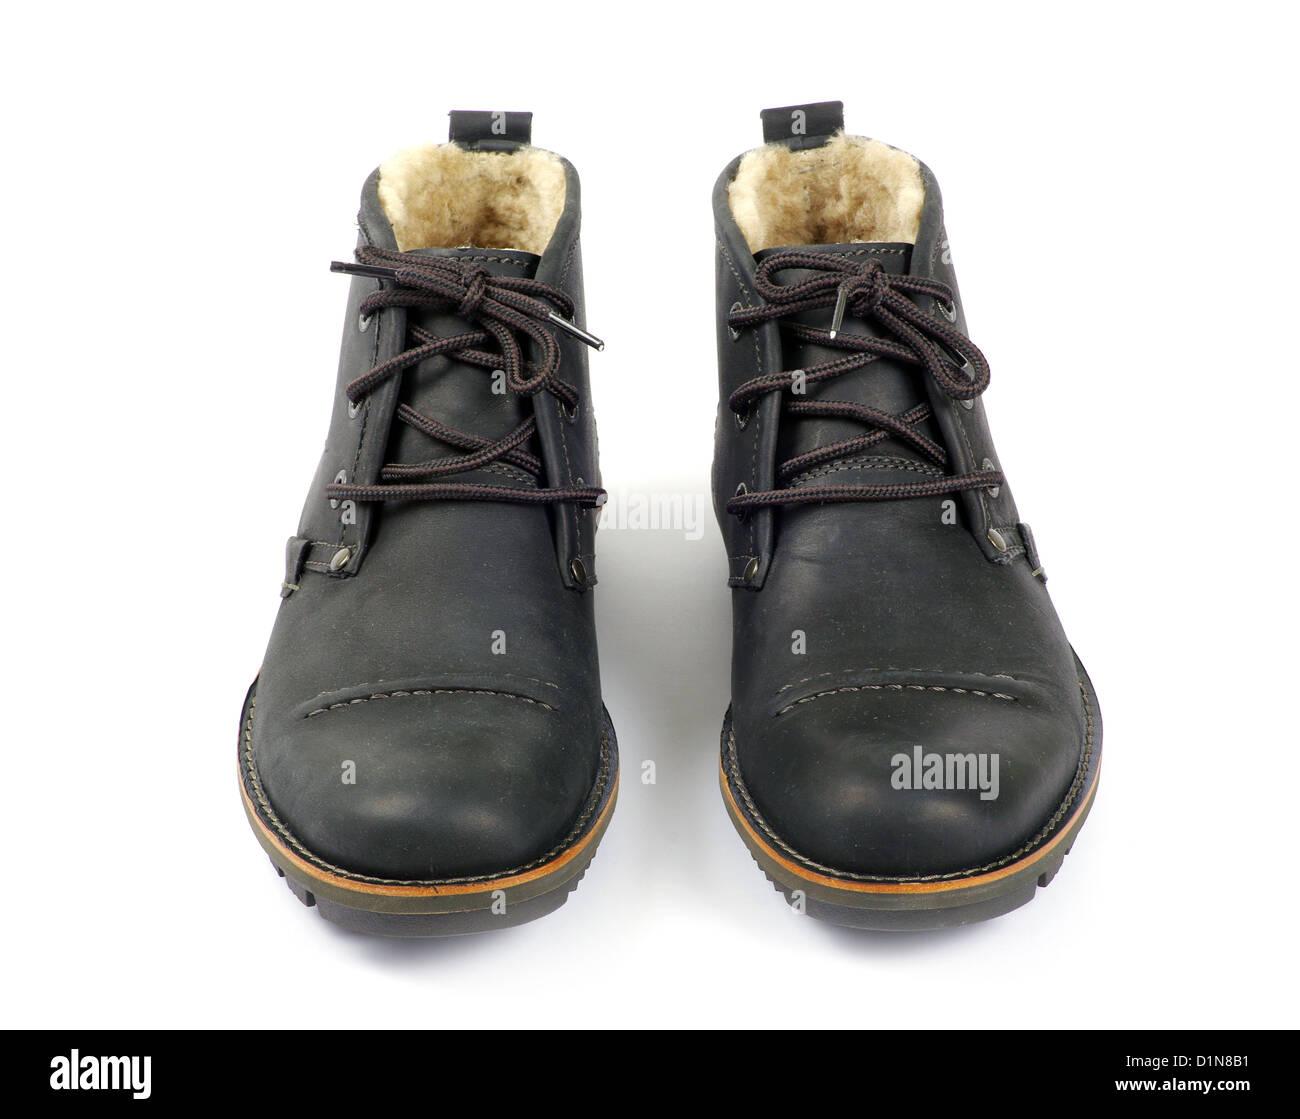 man's black shoes isolated on white background - Stock Image